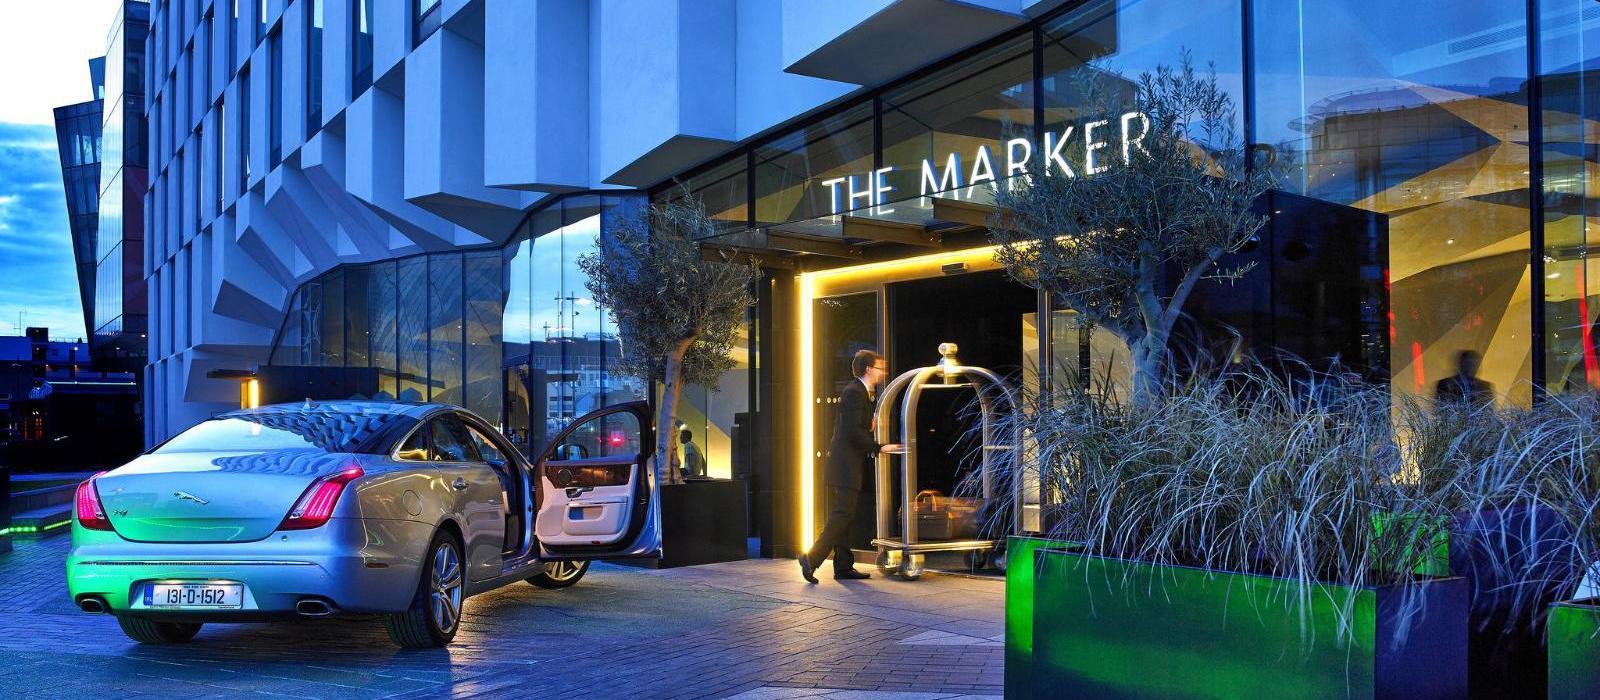 标志酒店(The Marker) 酒店外观图片  www.lhw.cn